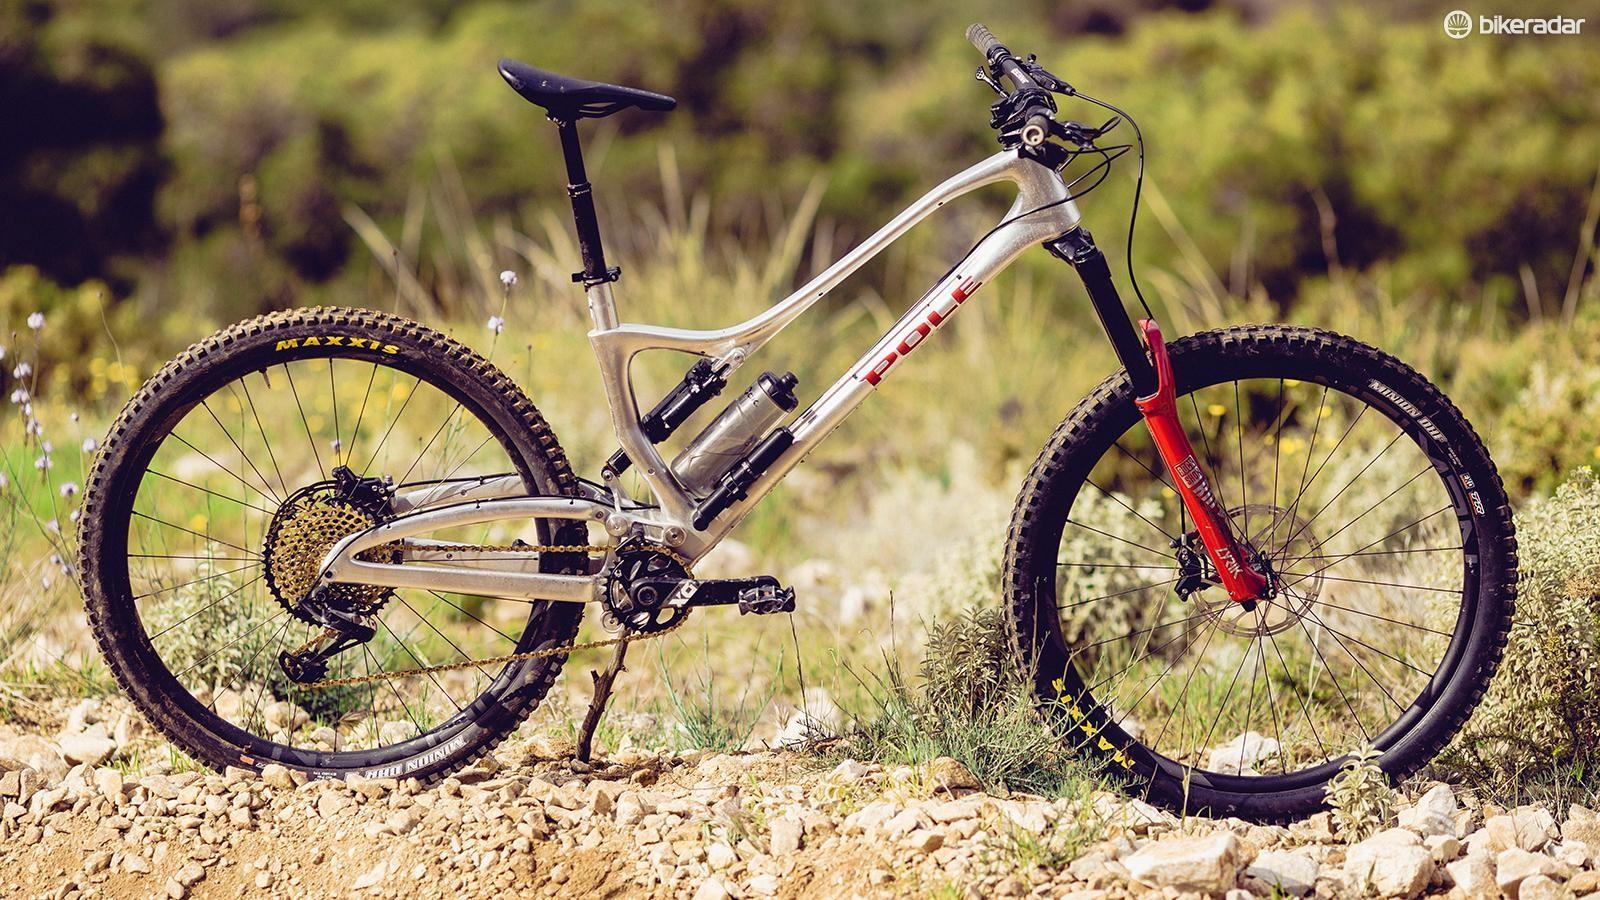 02_bikeradar_bike_of_the_future-1543408847138-anu1nyjdc02f-3f9fbcf